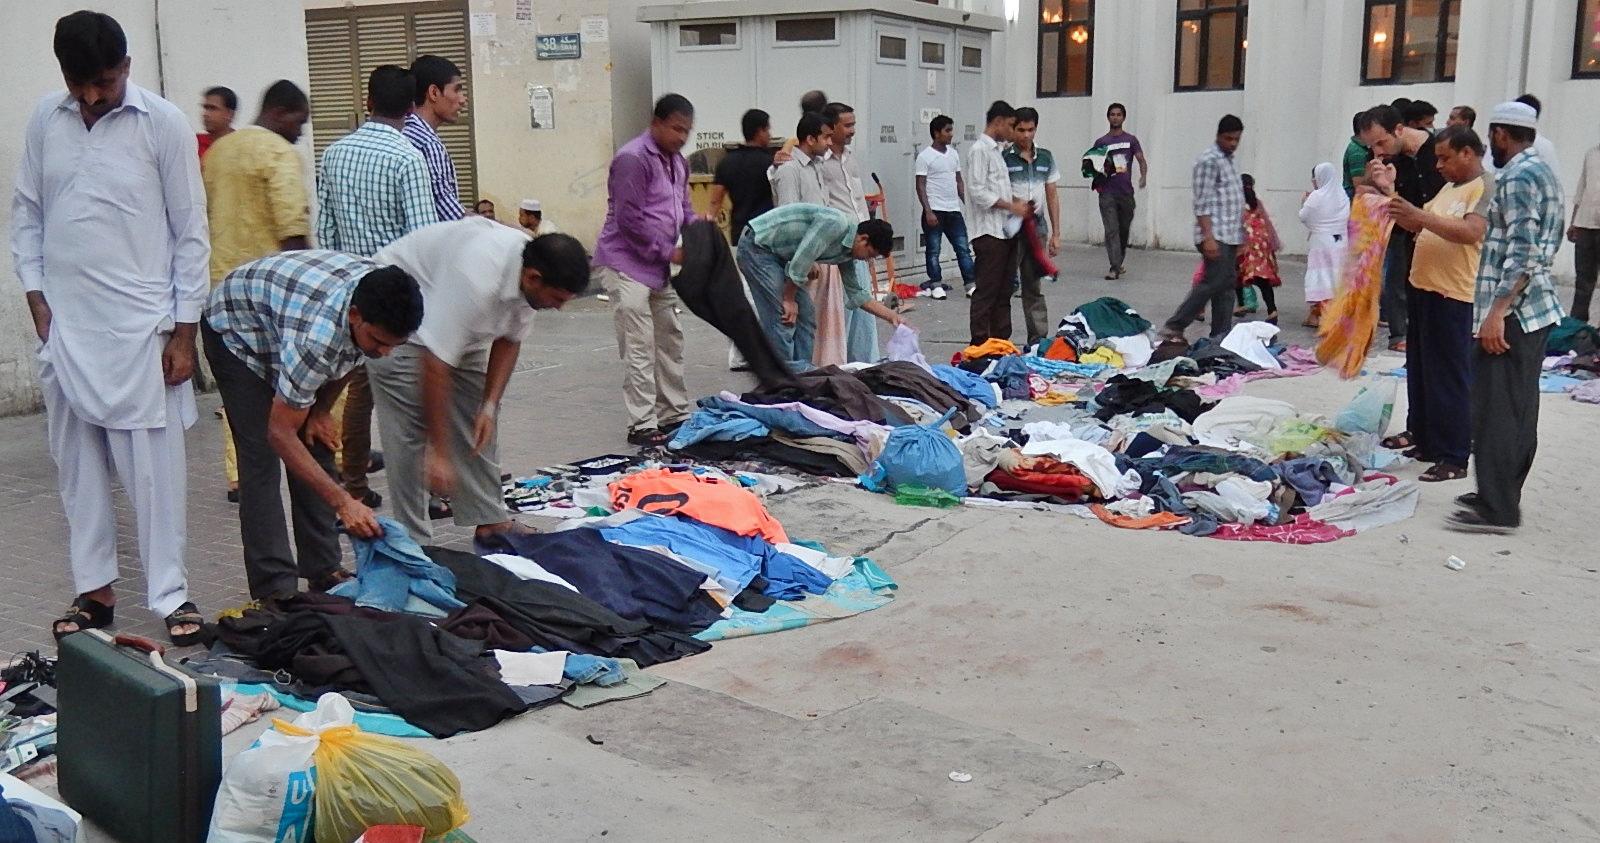 Where to Buy Cheap Clothes in Dubai - Dubai Expats Guide